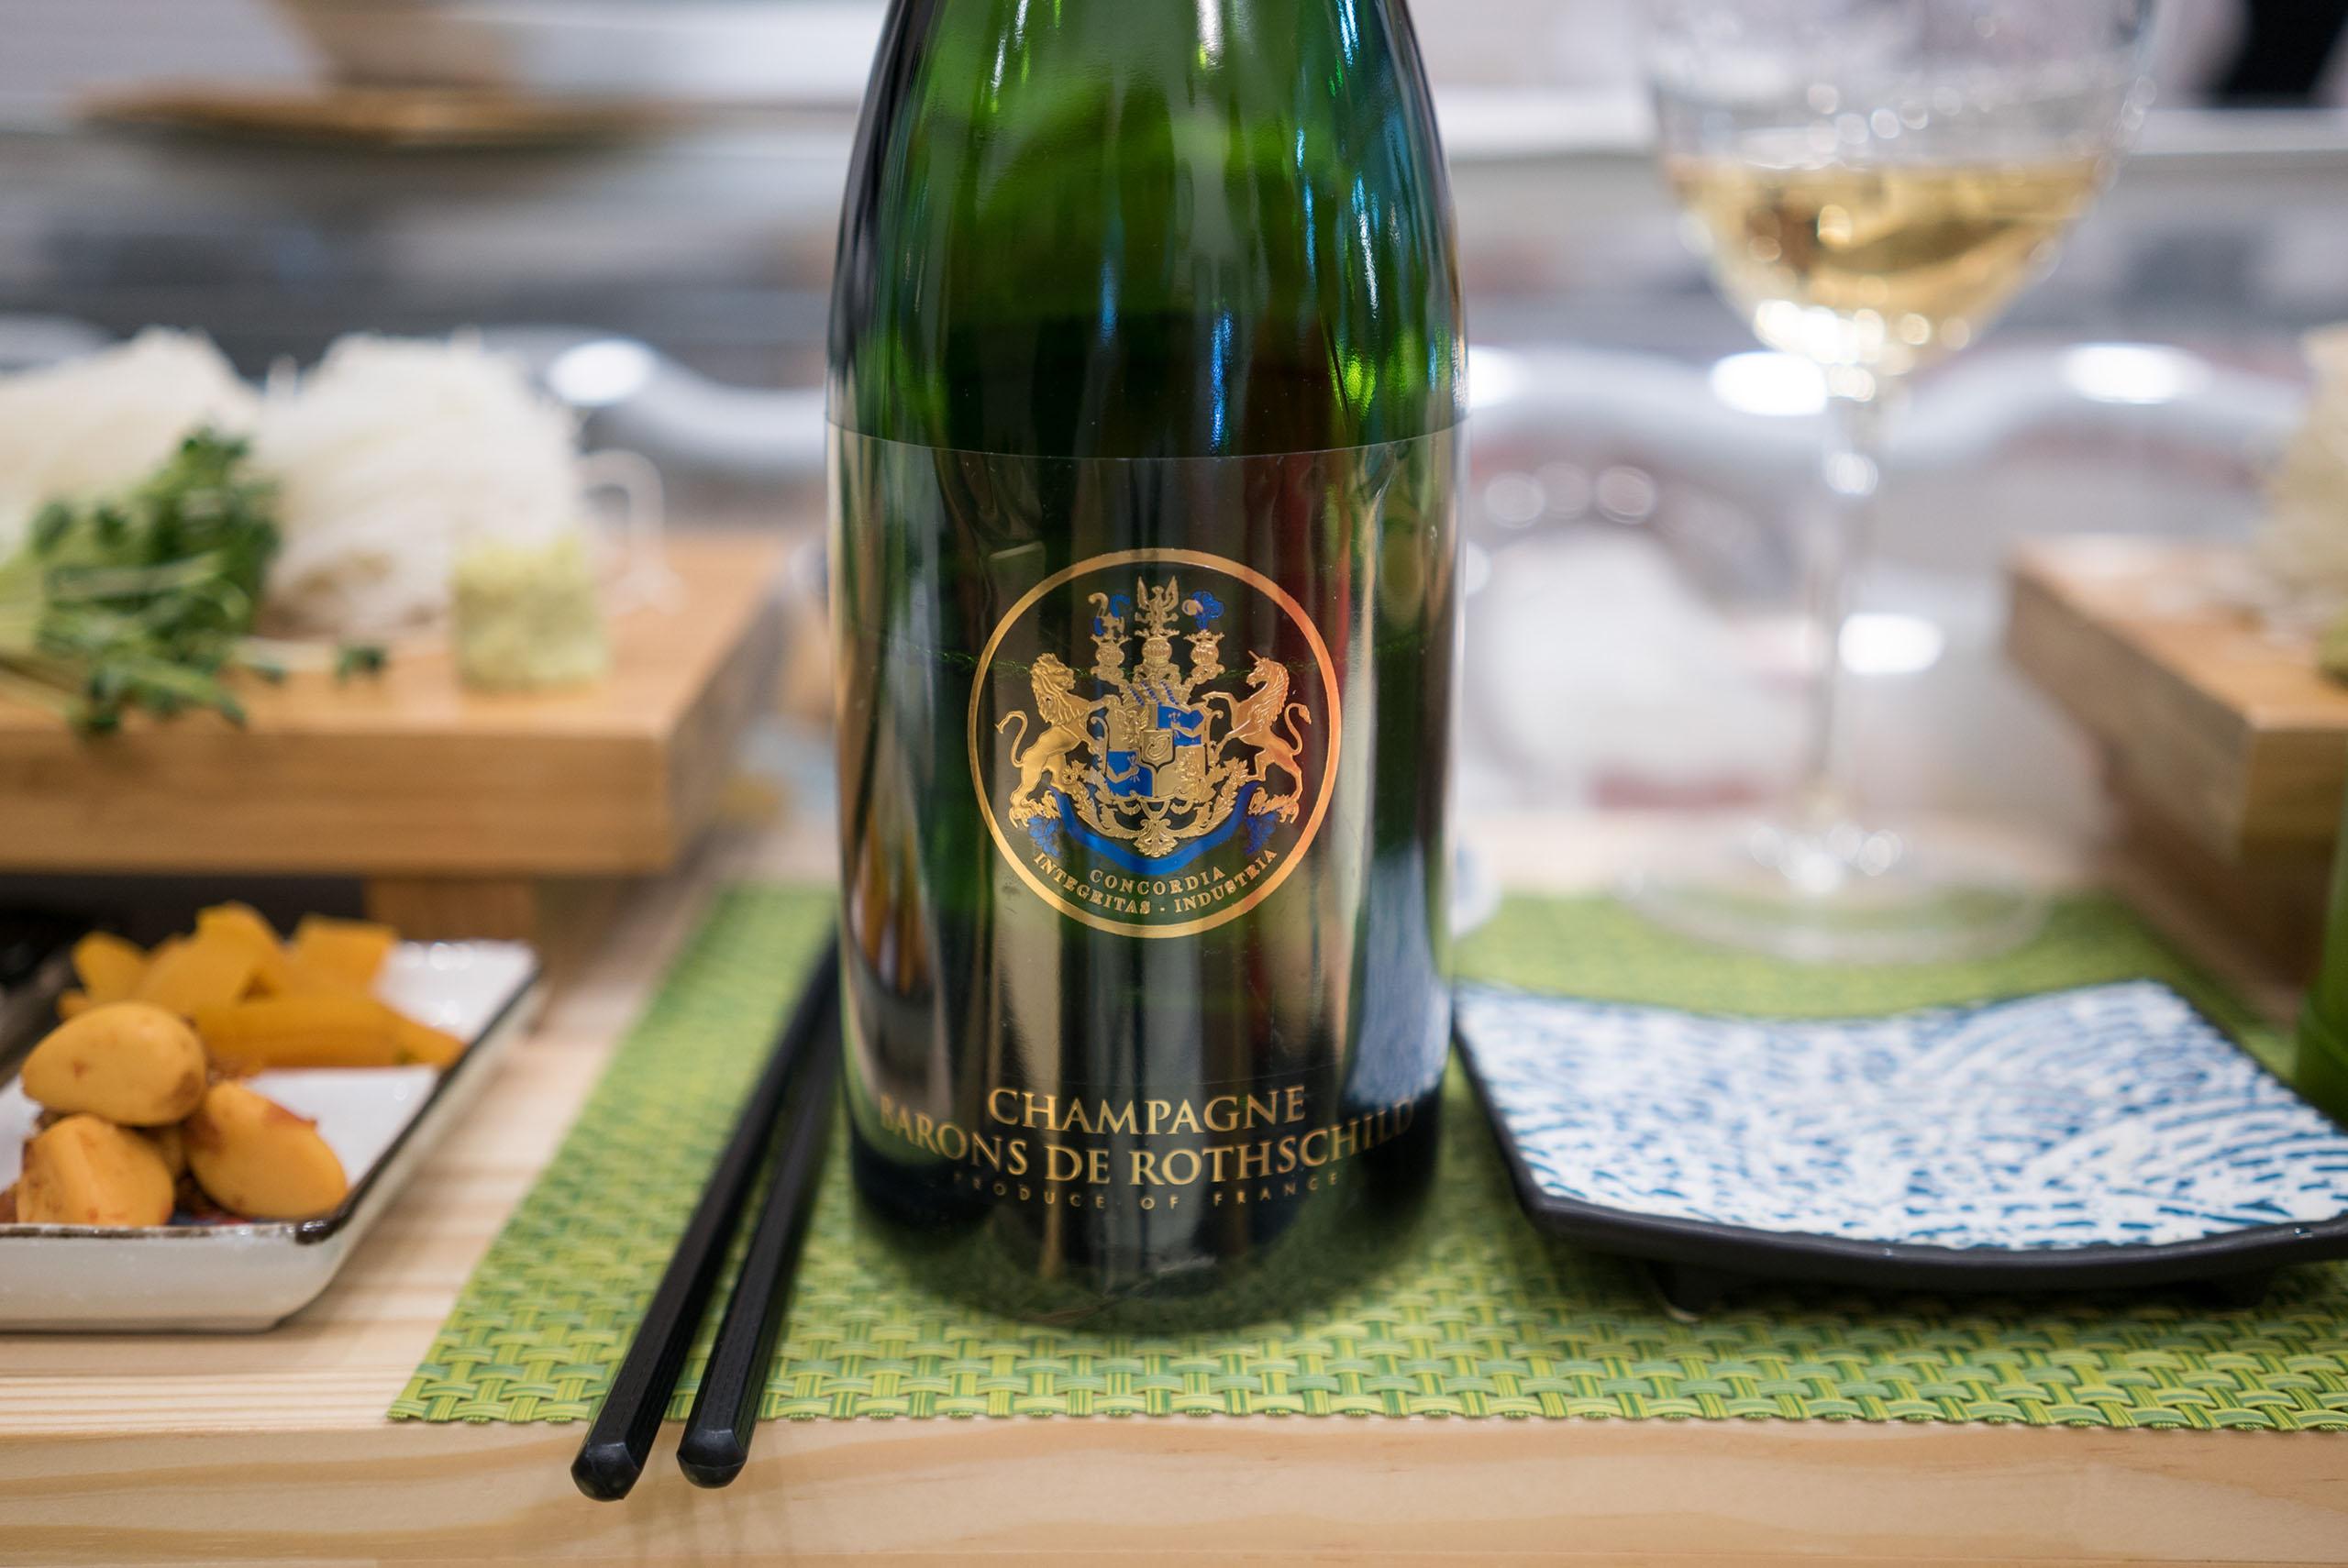 Champagne de Rothschild Blanc de Blanc